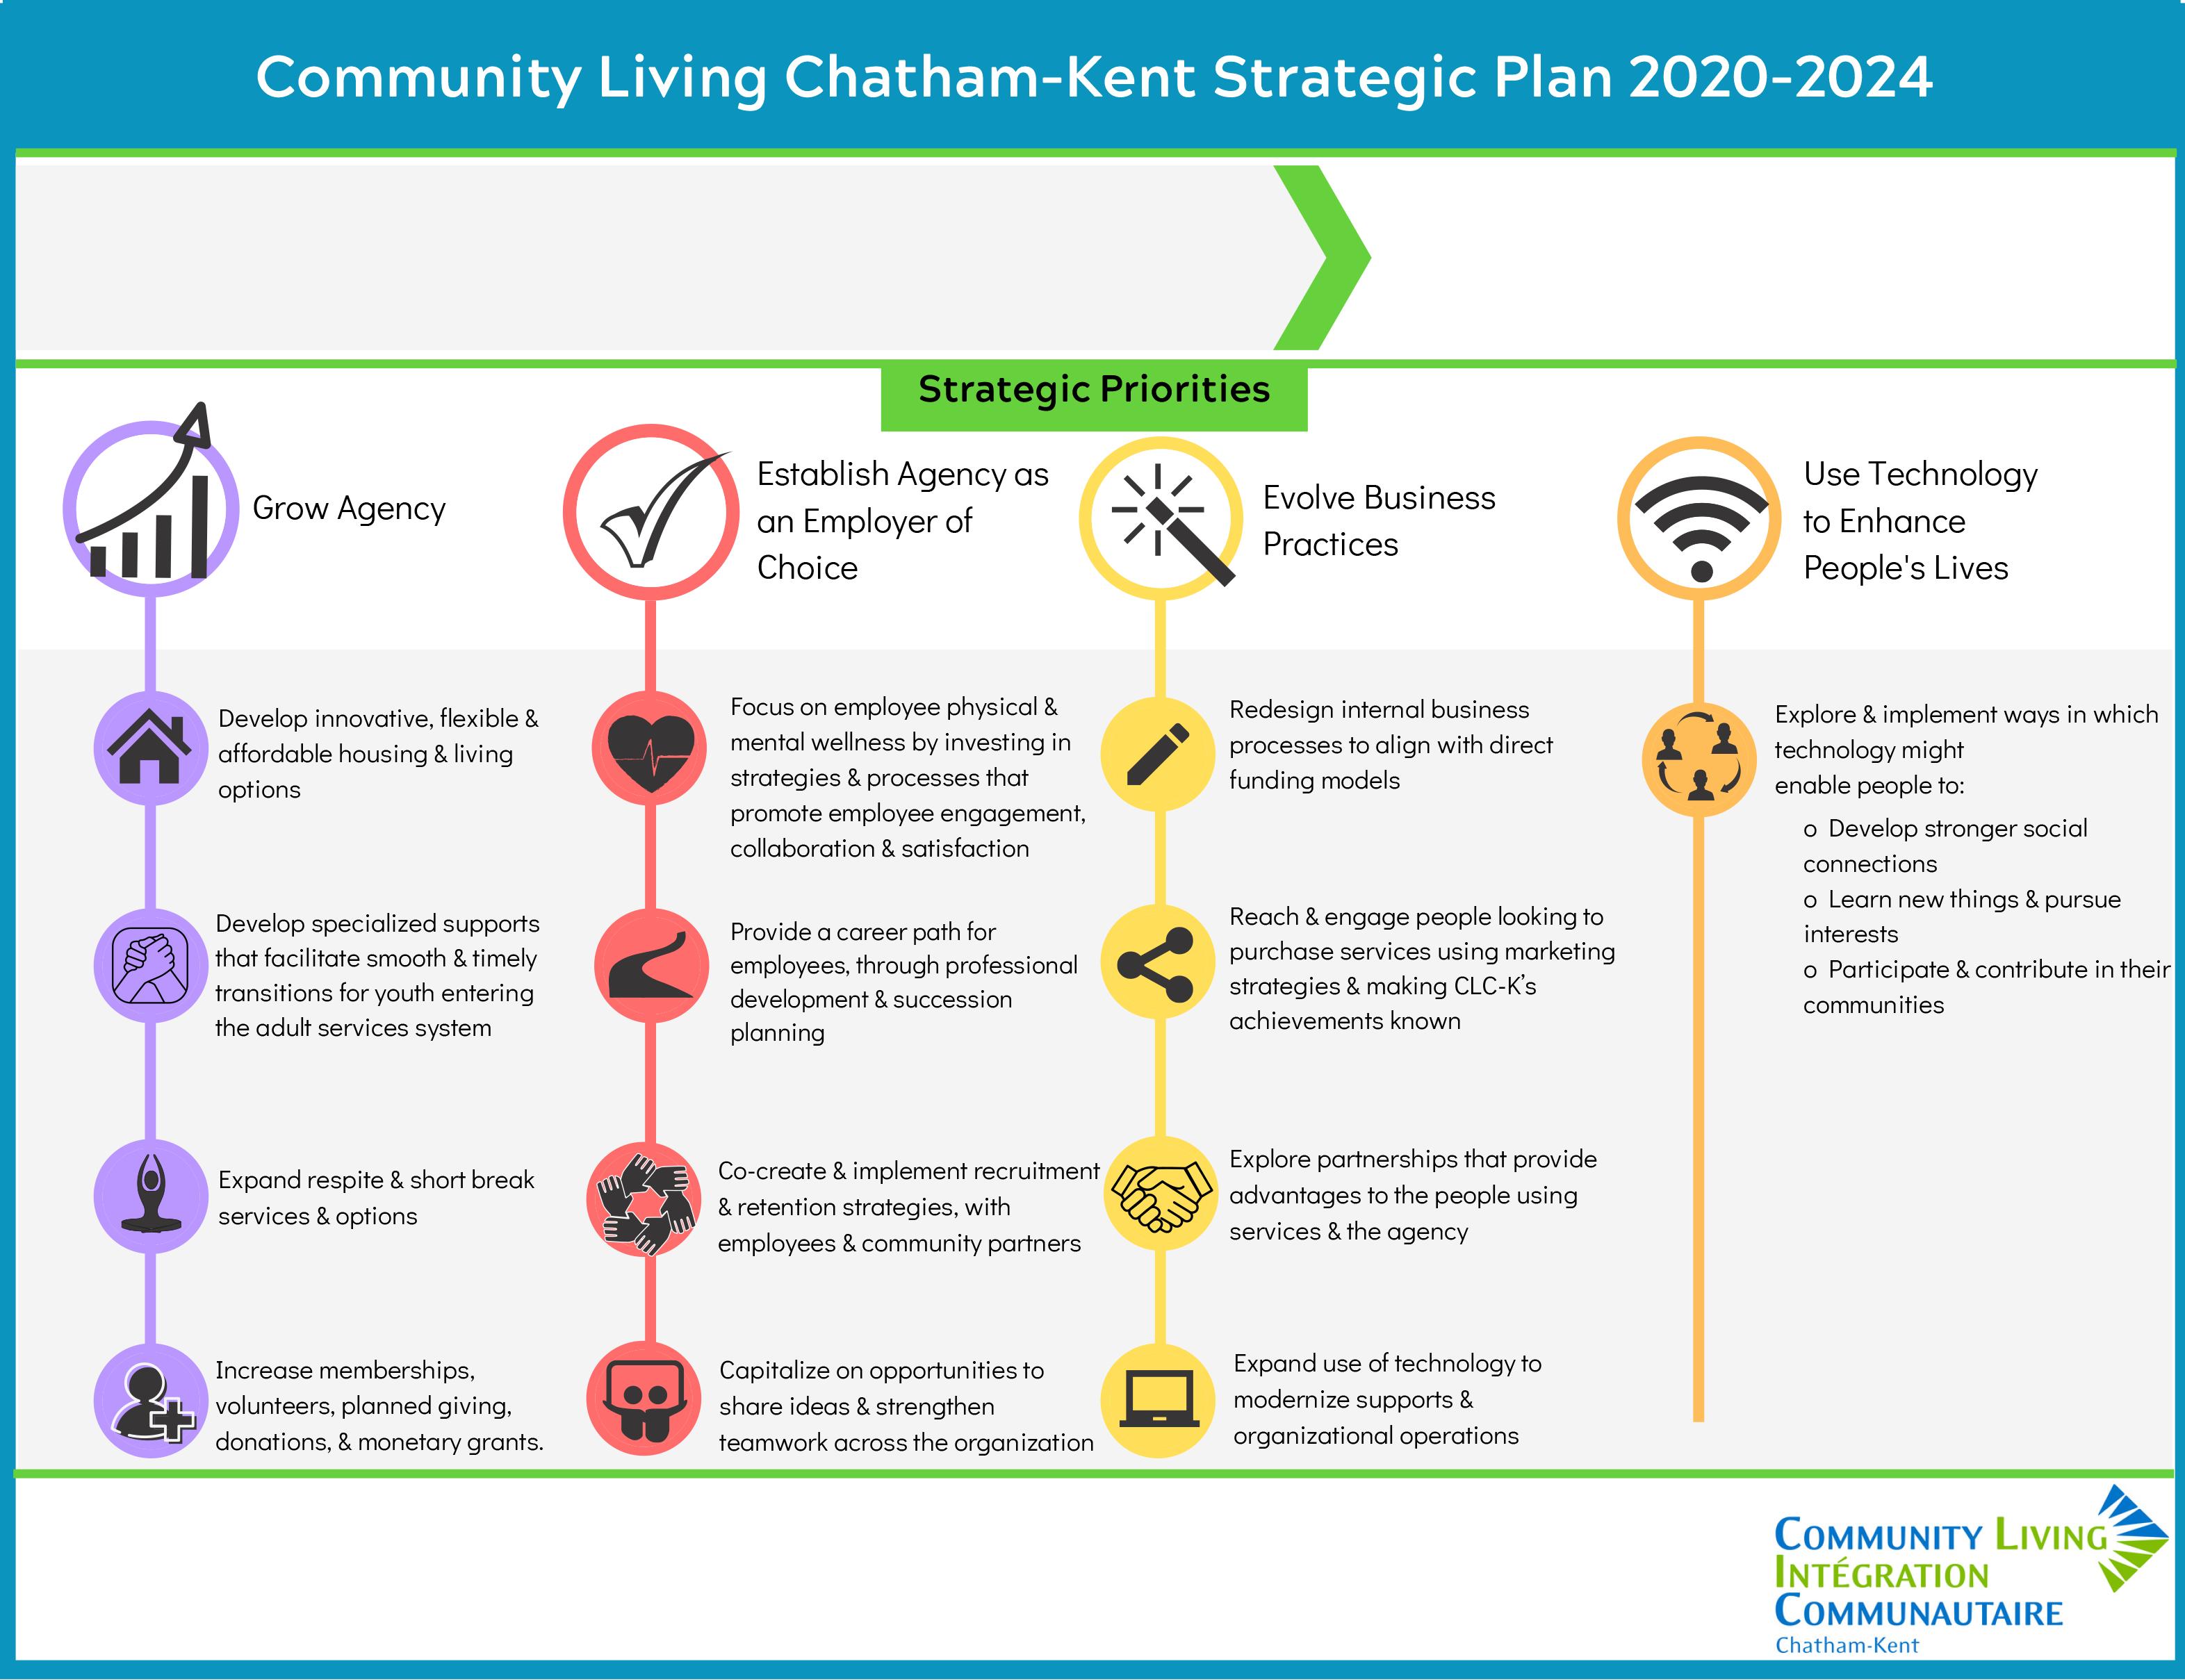 Community Living Chatham-Kent Strategic Plan 2020-2024